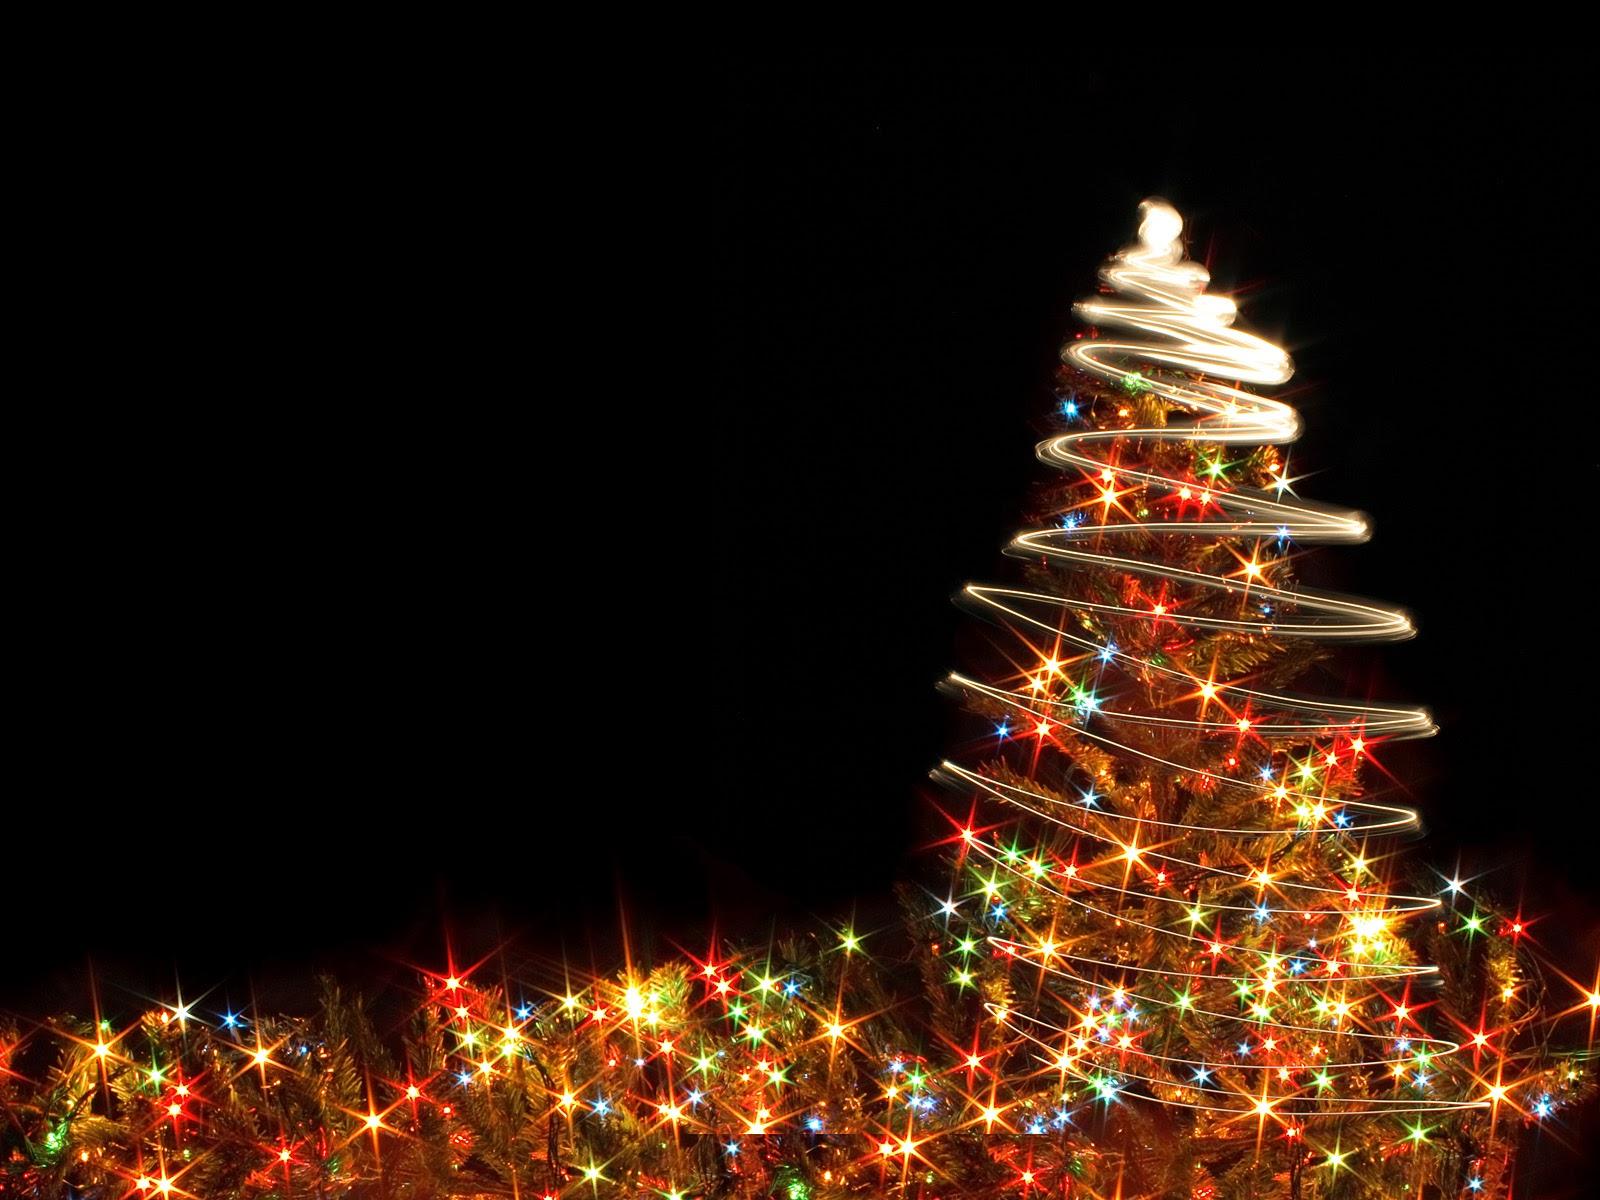 Christmas Tree Lights Wallpaper Hd